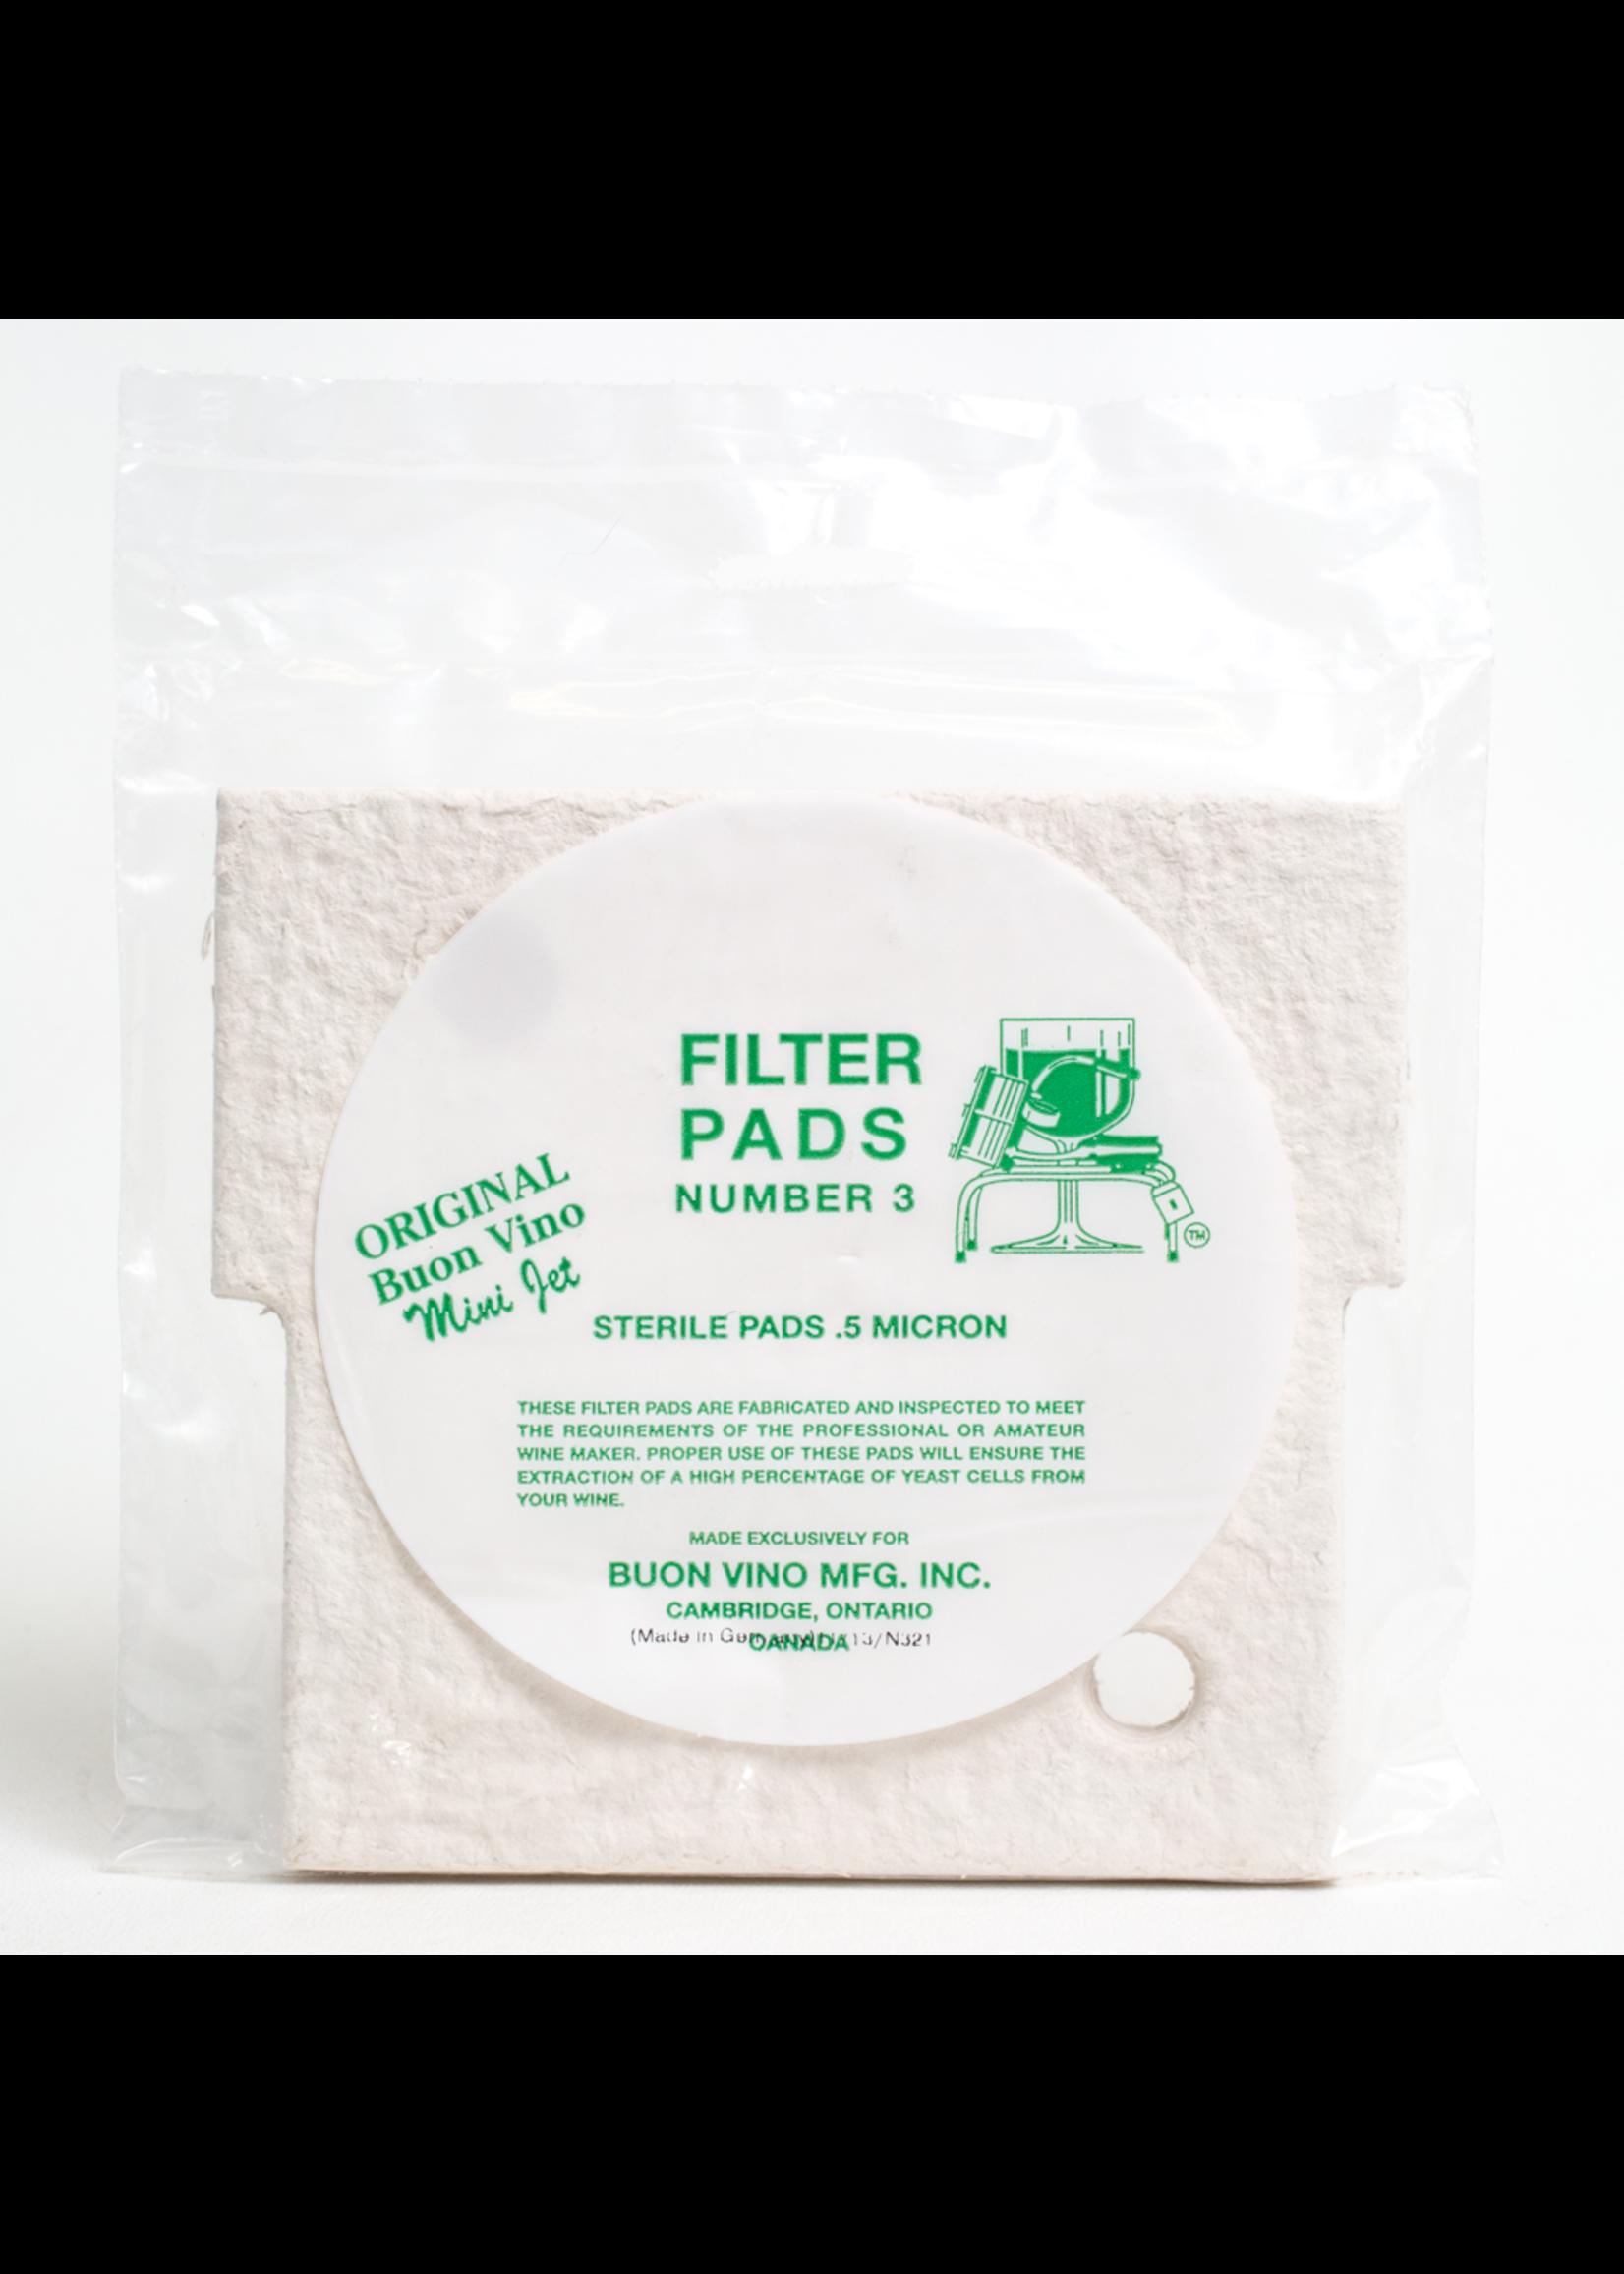 Racking/Bottling Filter Pad - Buon Vino Mini #3 Super Sterile 0.5 Micron (3/bag)